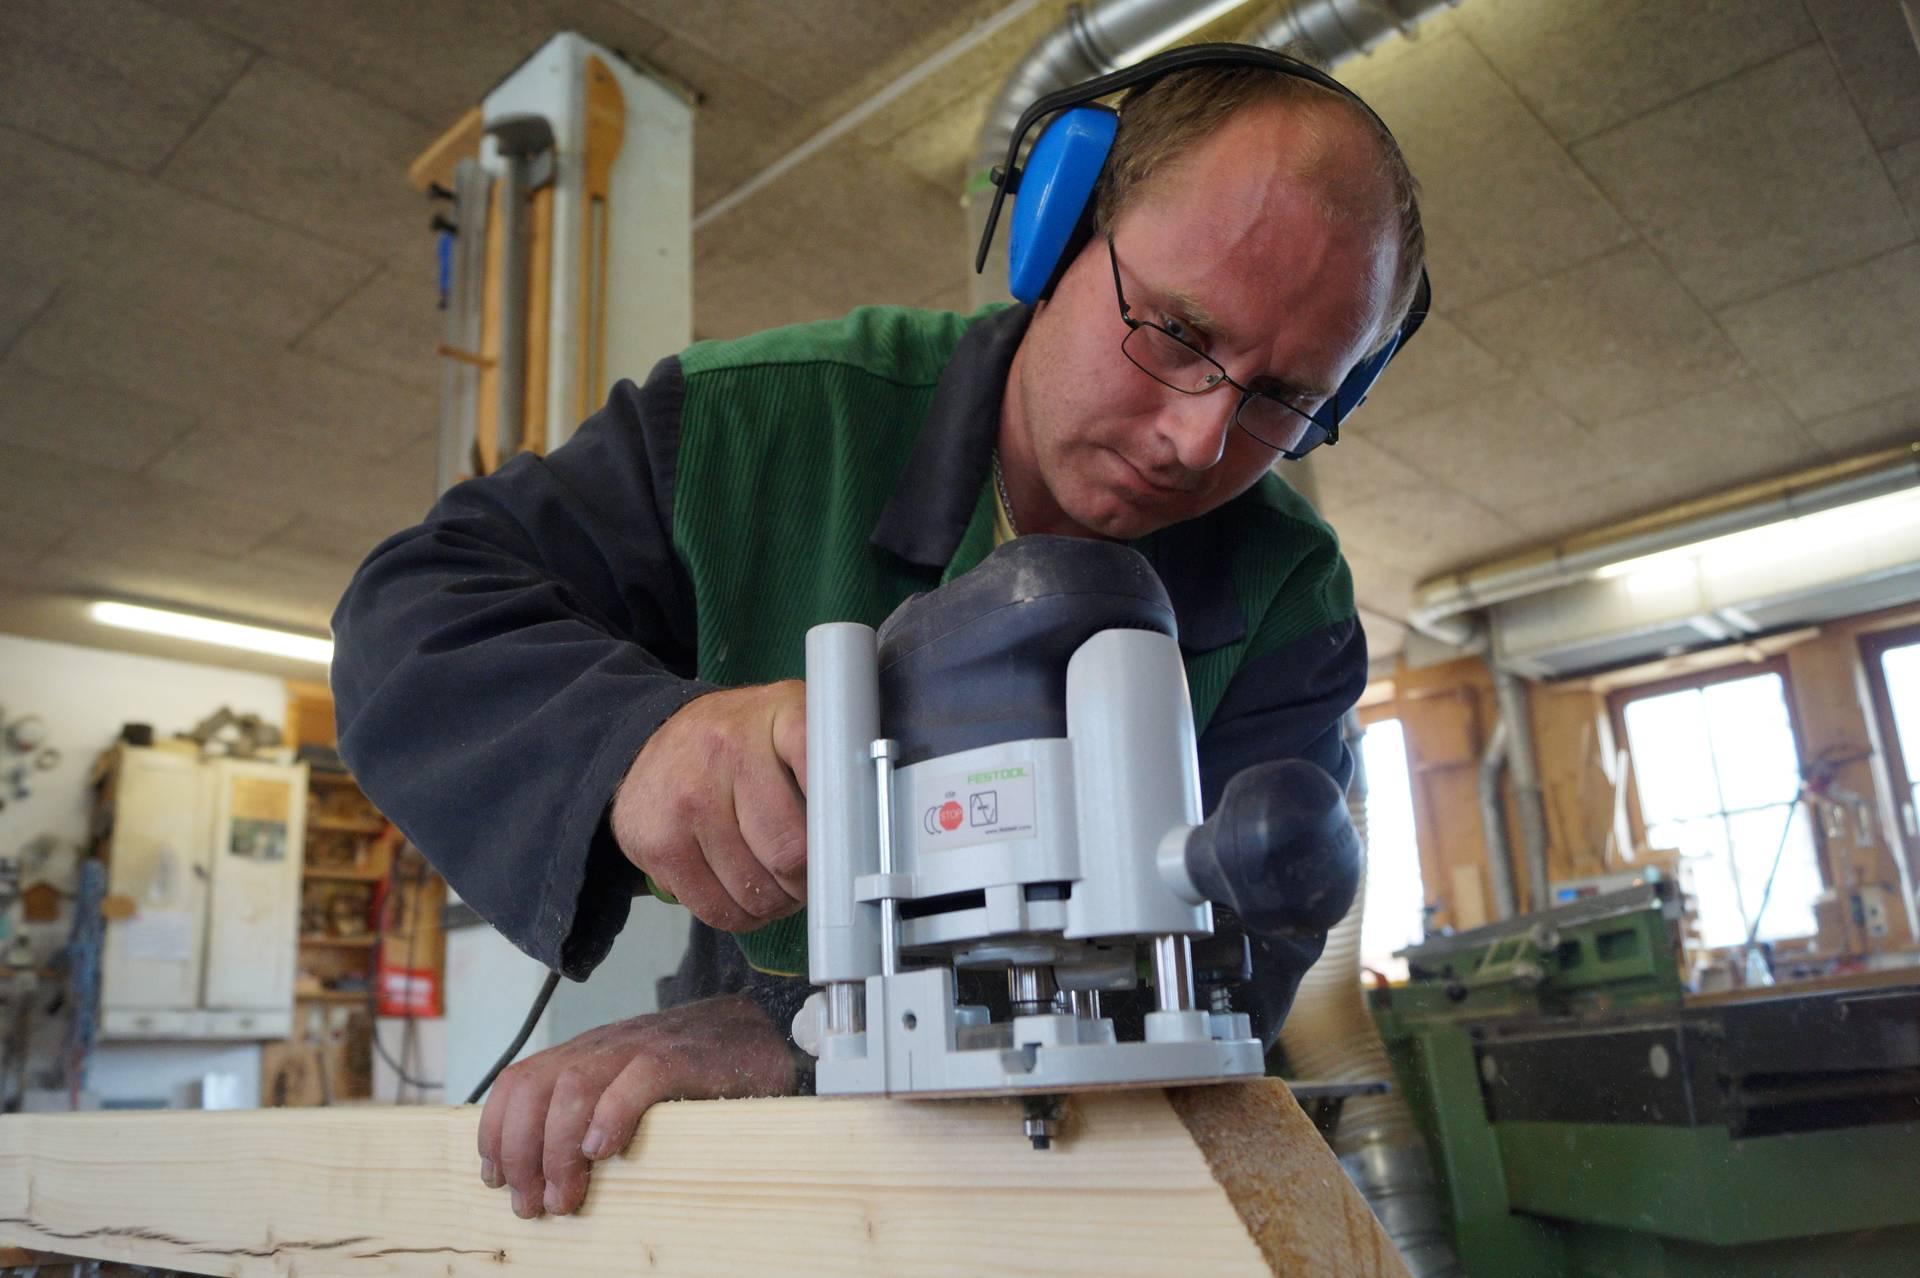 Bernd Moll beendet seine Ausbildung im Juli.